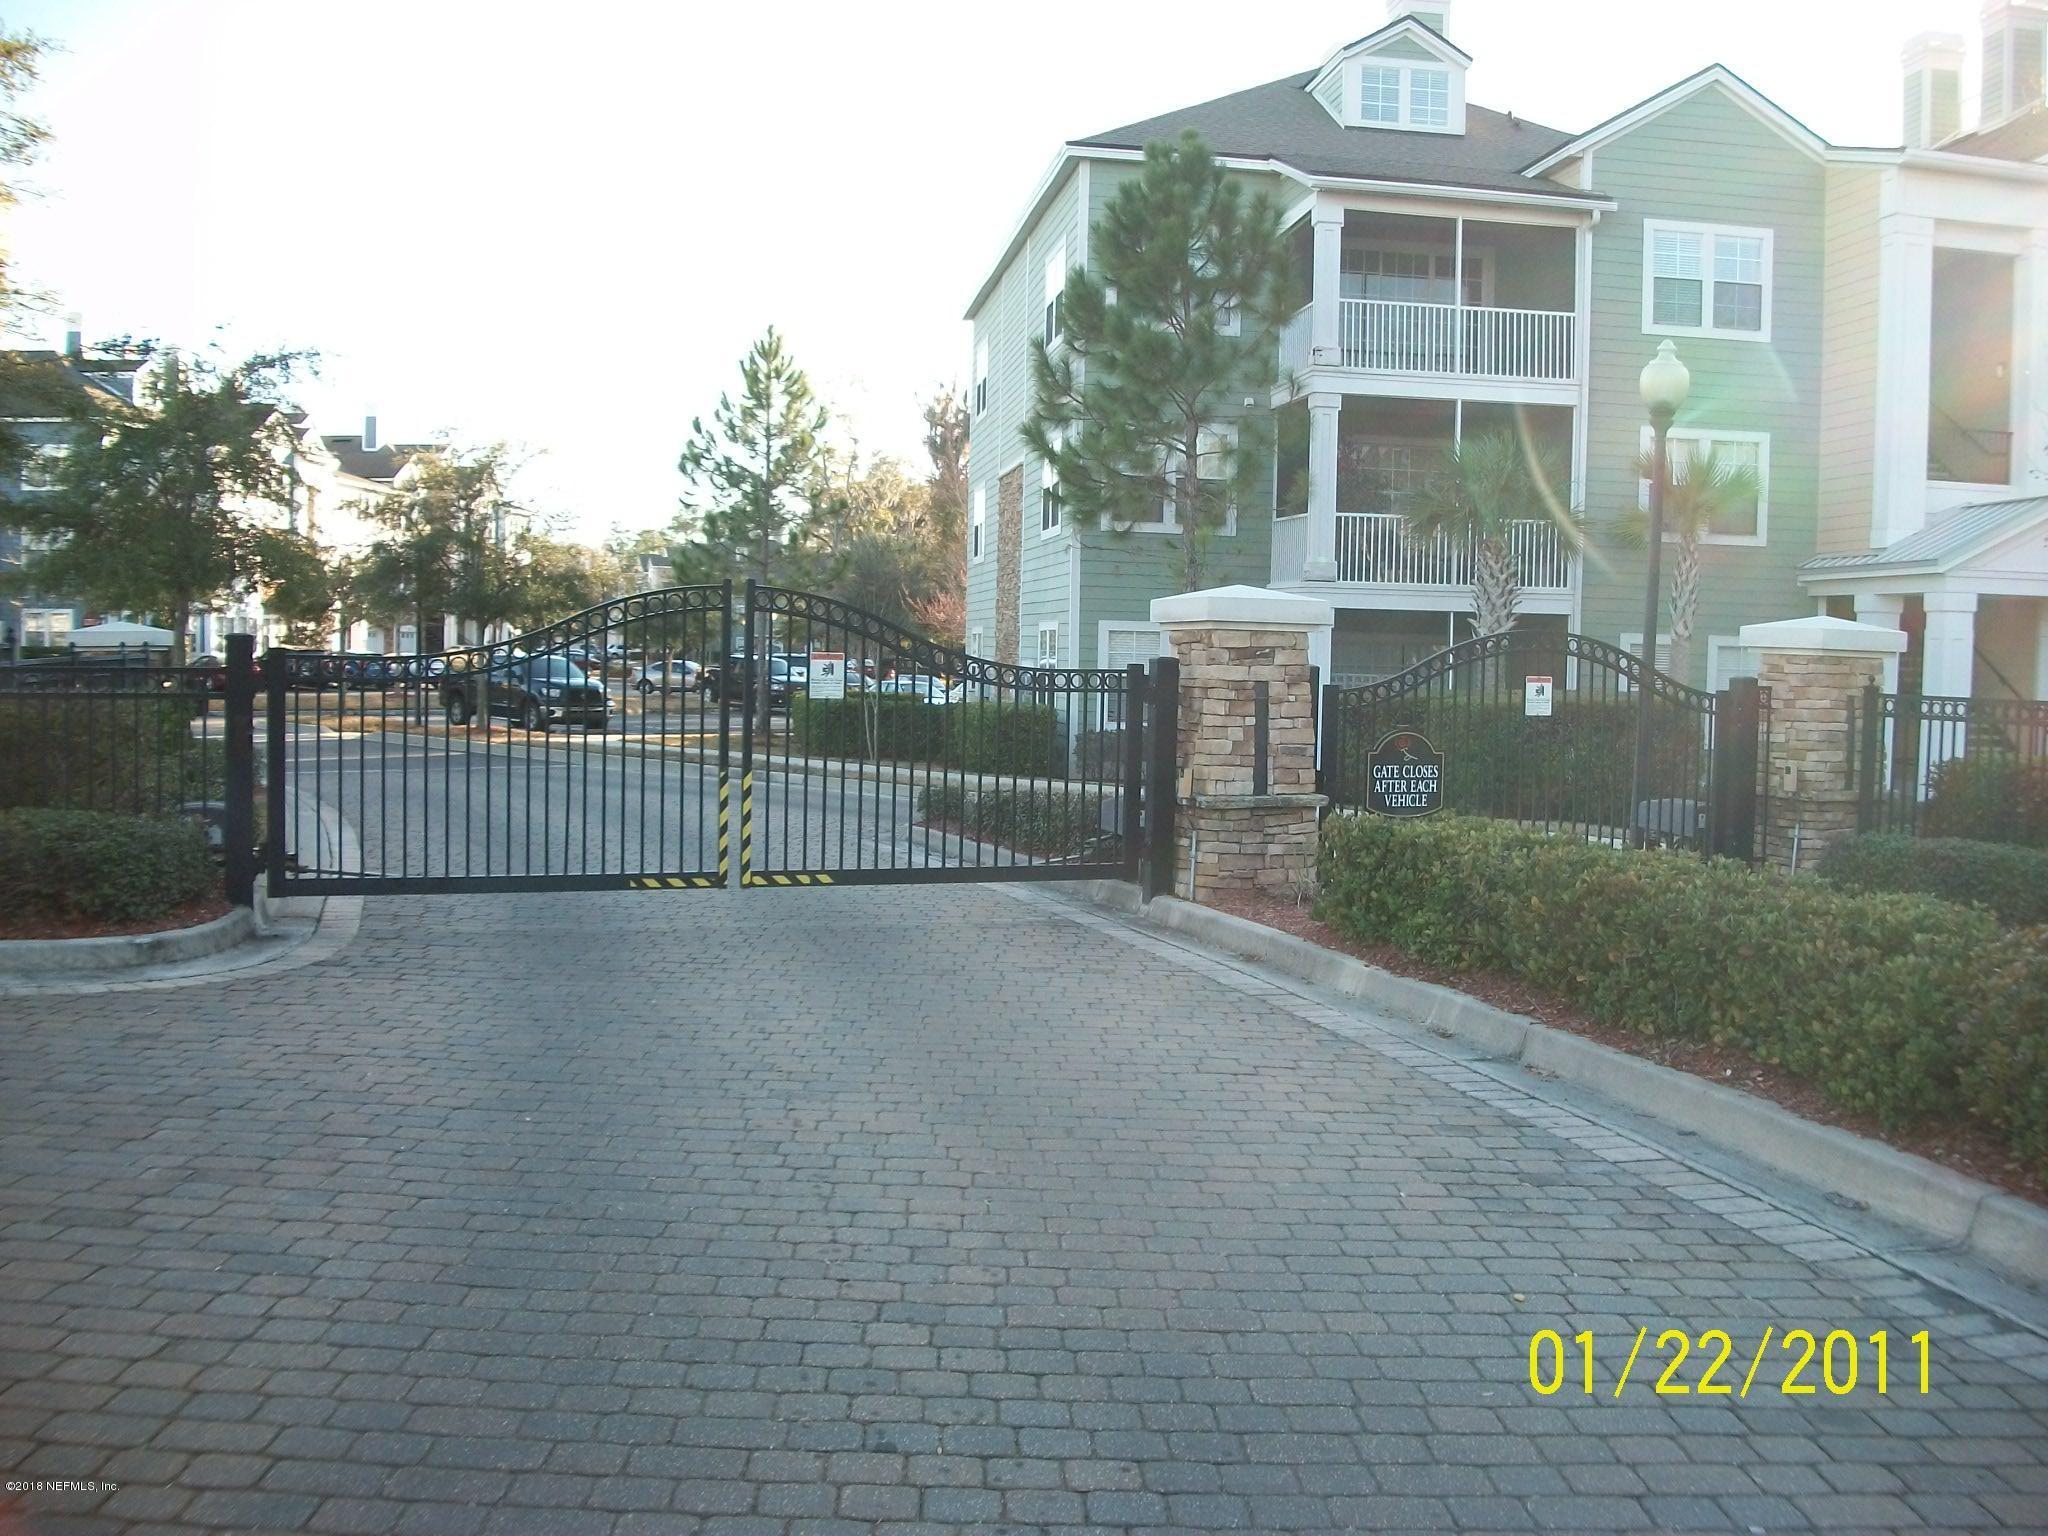 8550 TOUCHTON, JACKSONVILLE, FLORIDA 32216, 1 Bedroom Bedrooms, ,1 BathroomBathrooms,Rental,For Rent,TOUCHTON,1082855